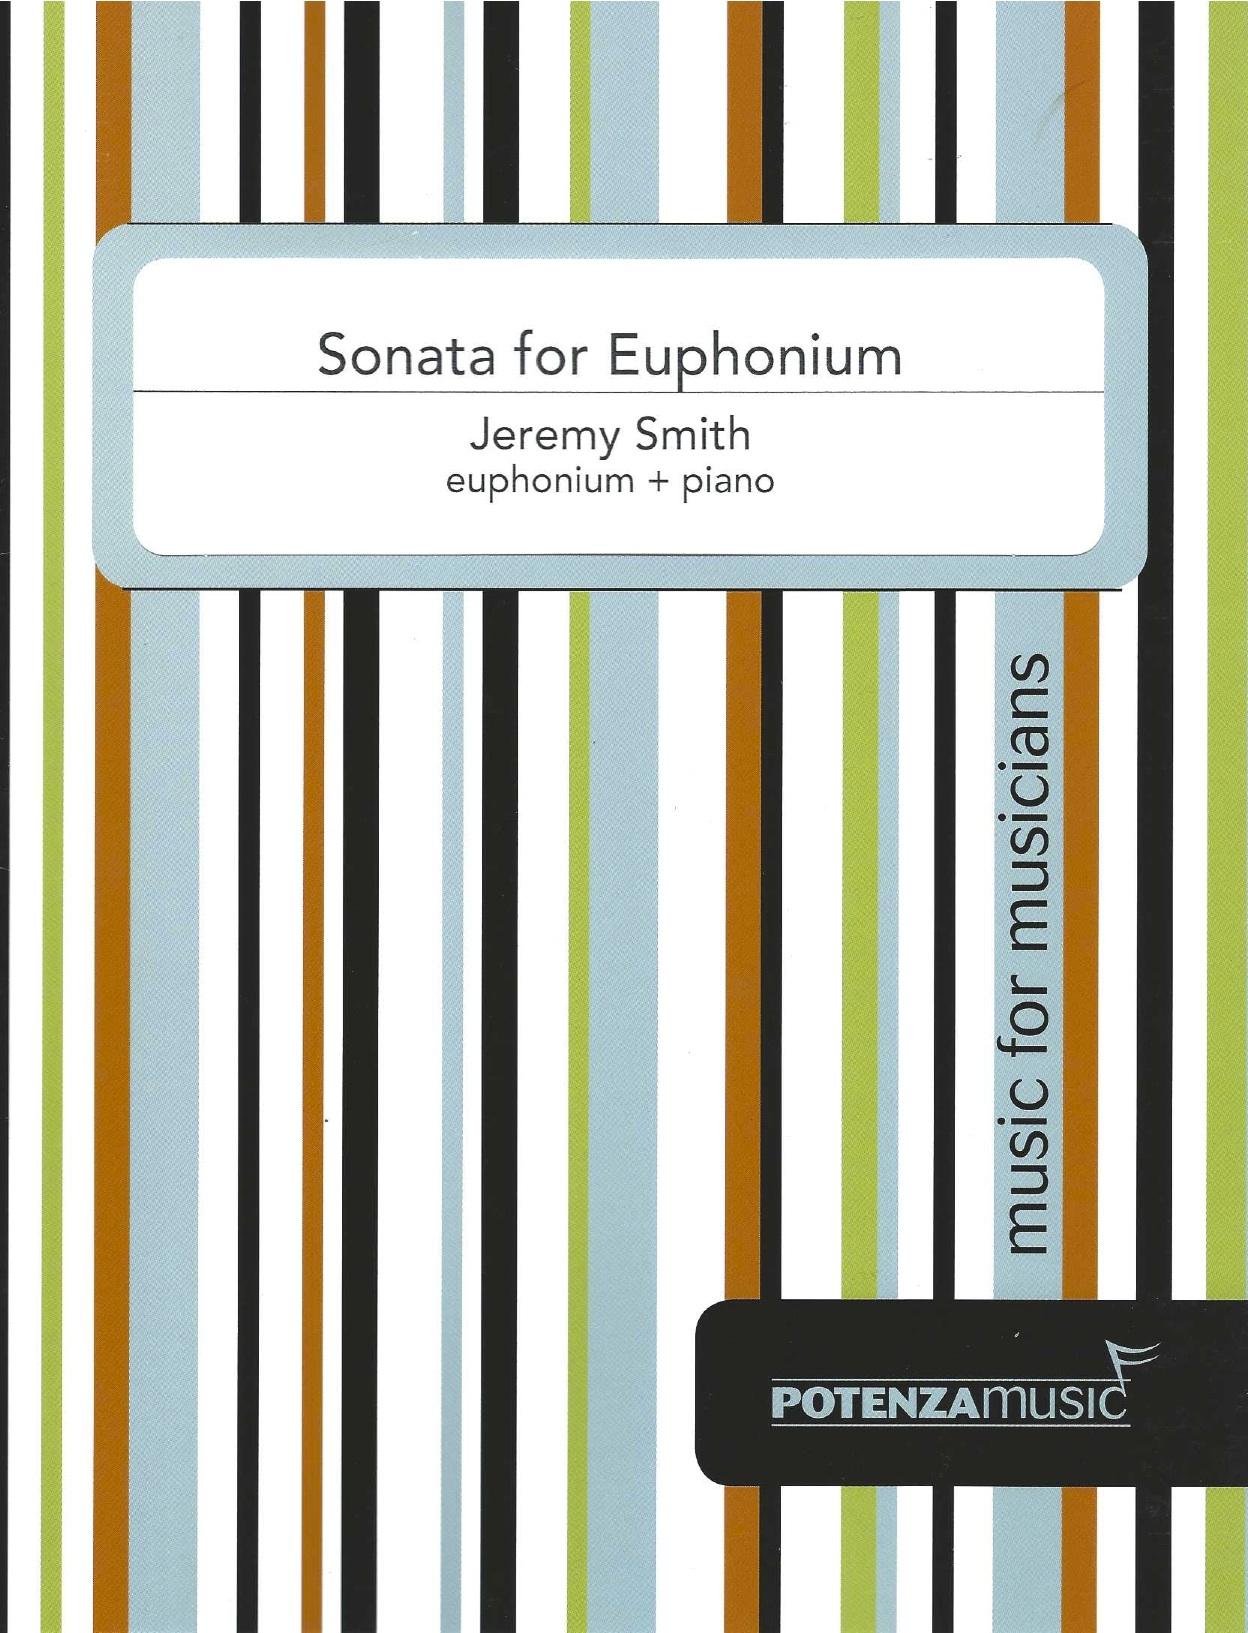 Sonata for Euphonium - Jeremy Smith  - Euphonium and Piano